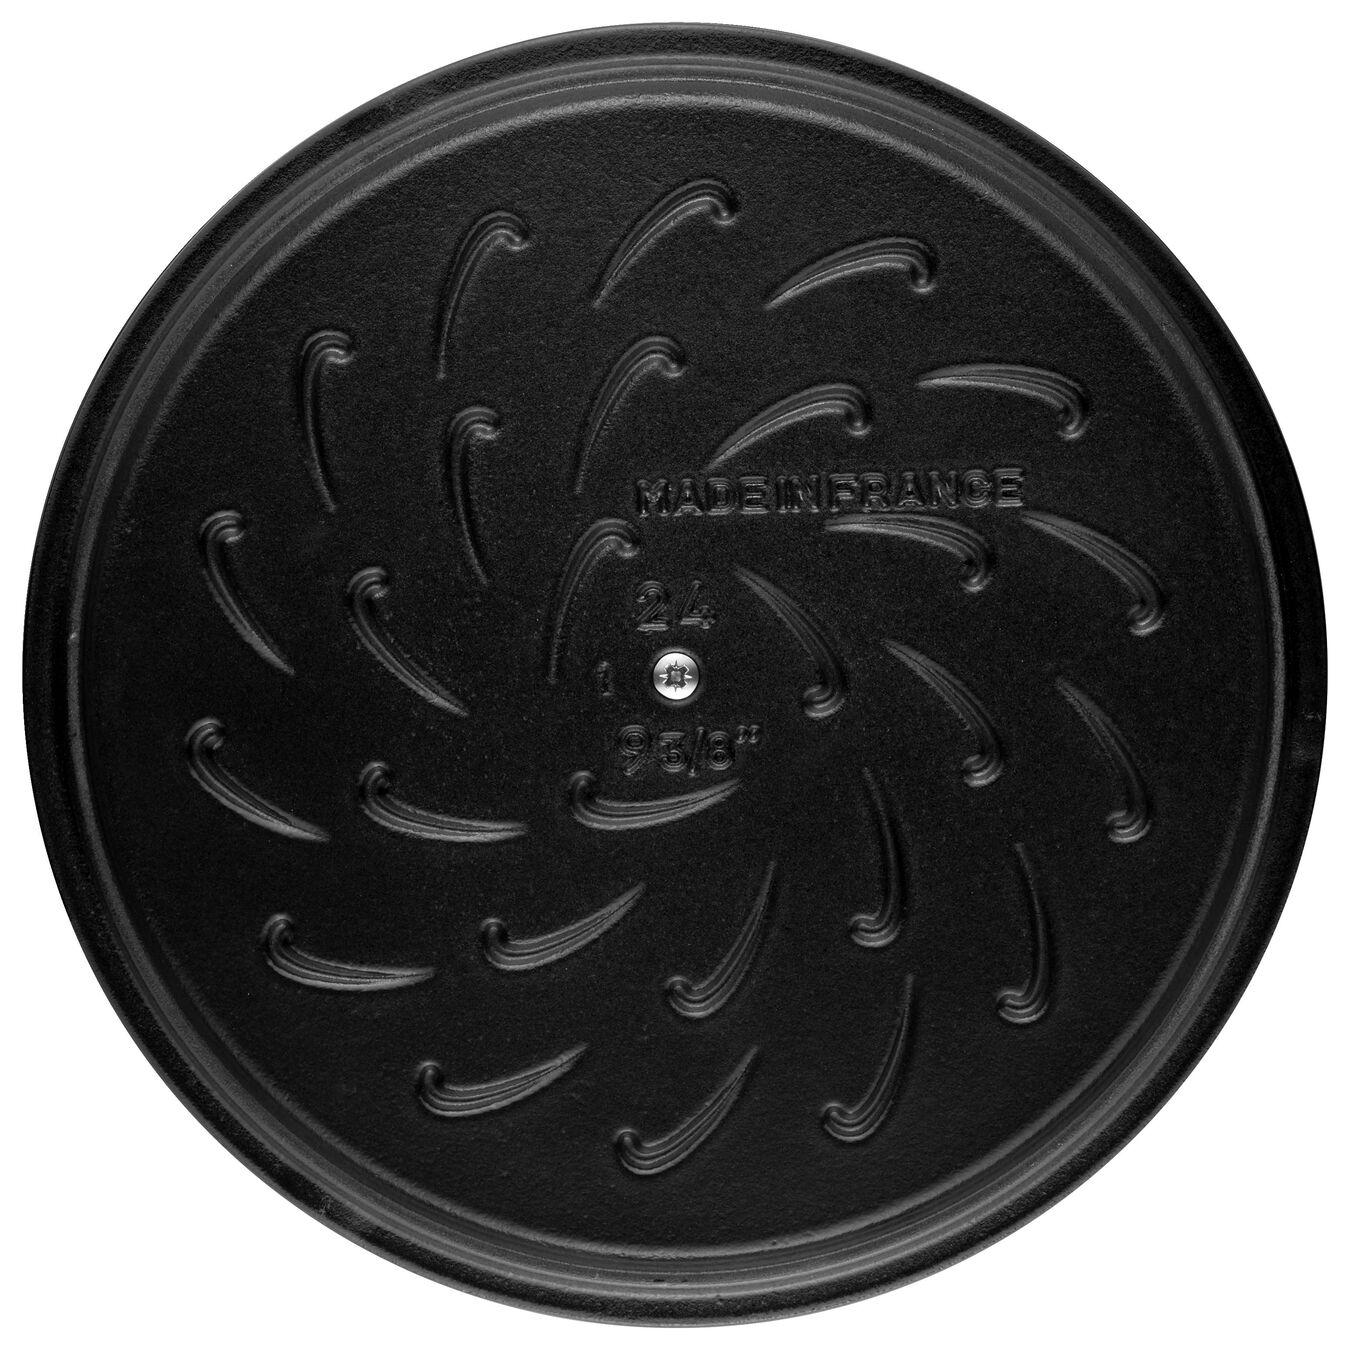 Caçarola redonda baixa chistera Chistera 28 cm, Ferro fundido,,large 6